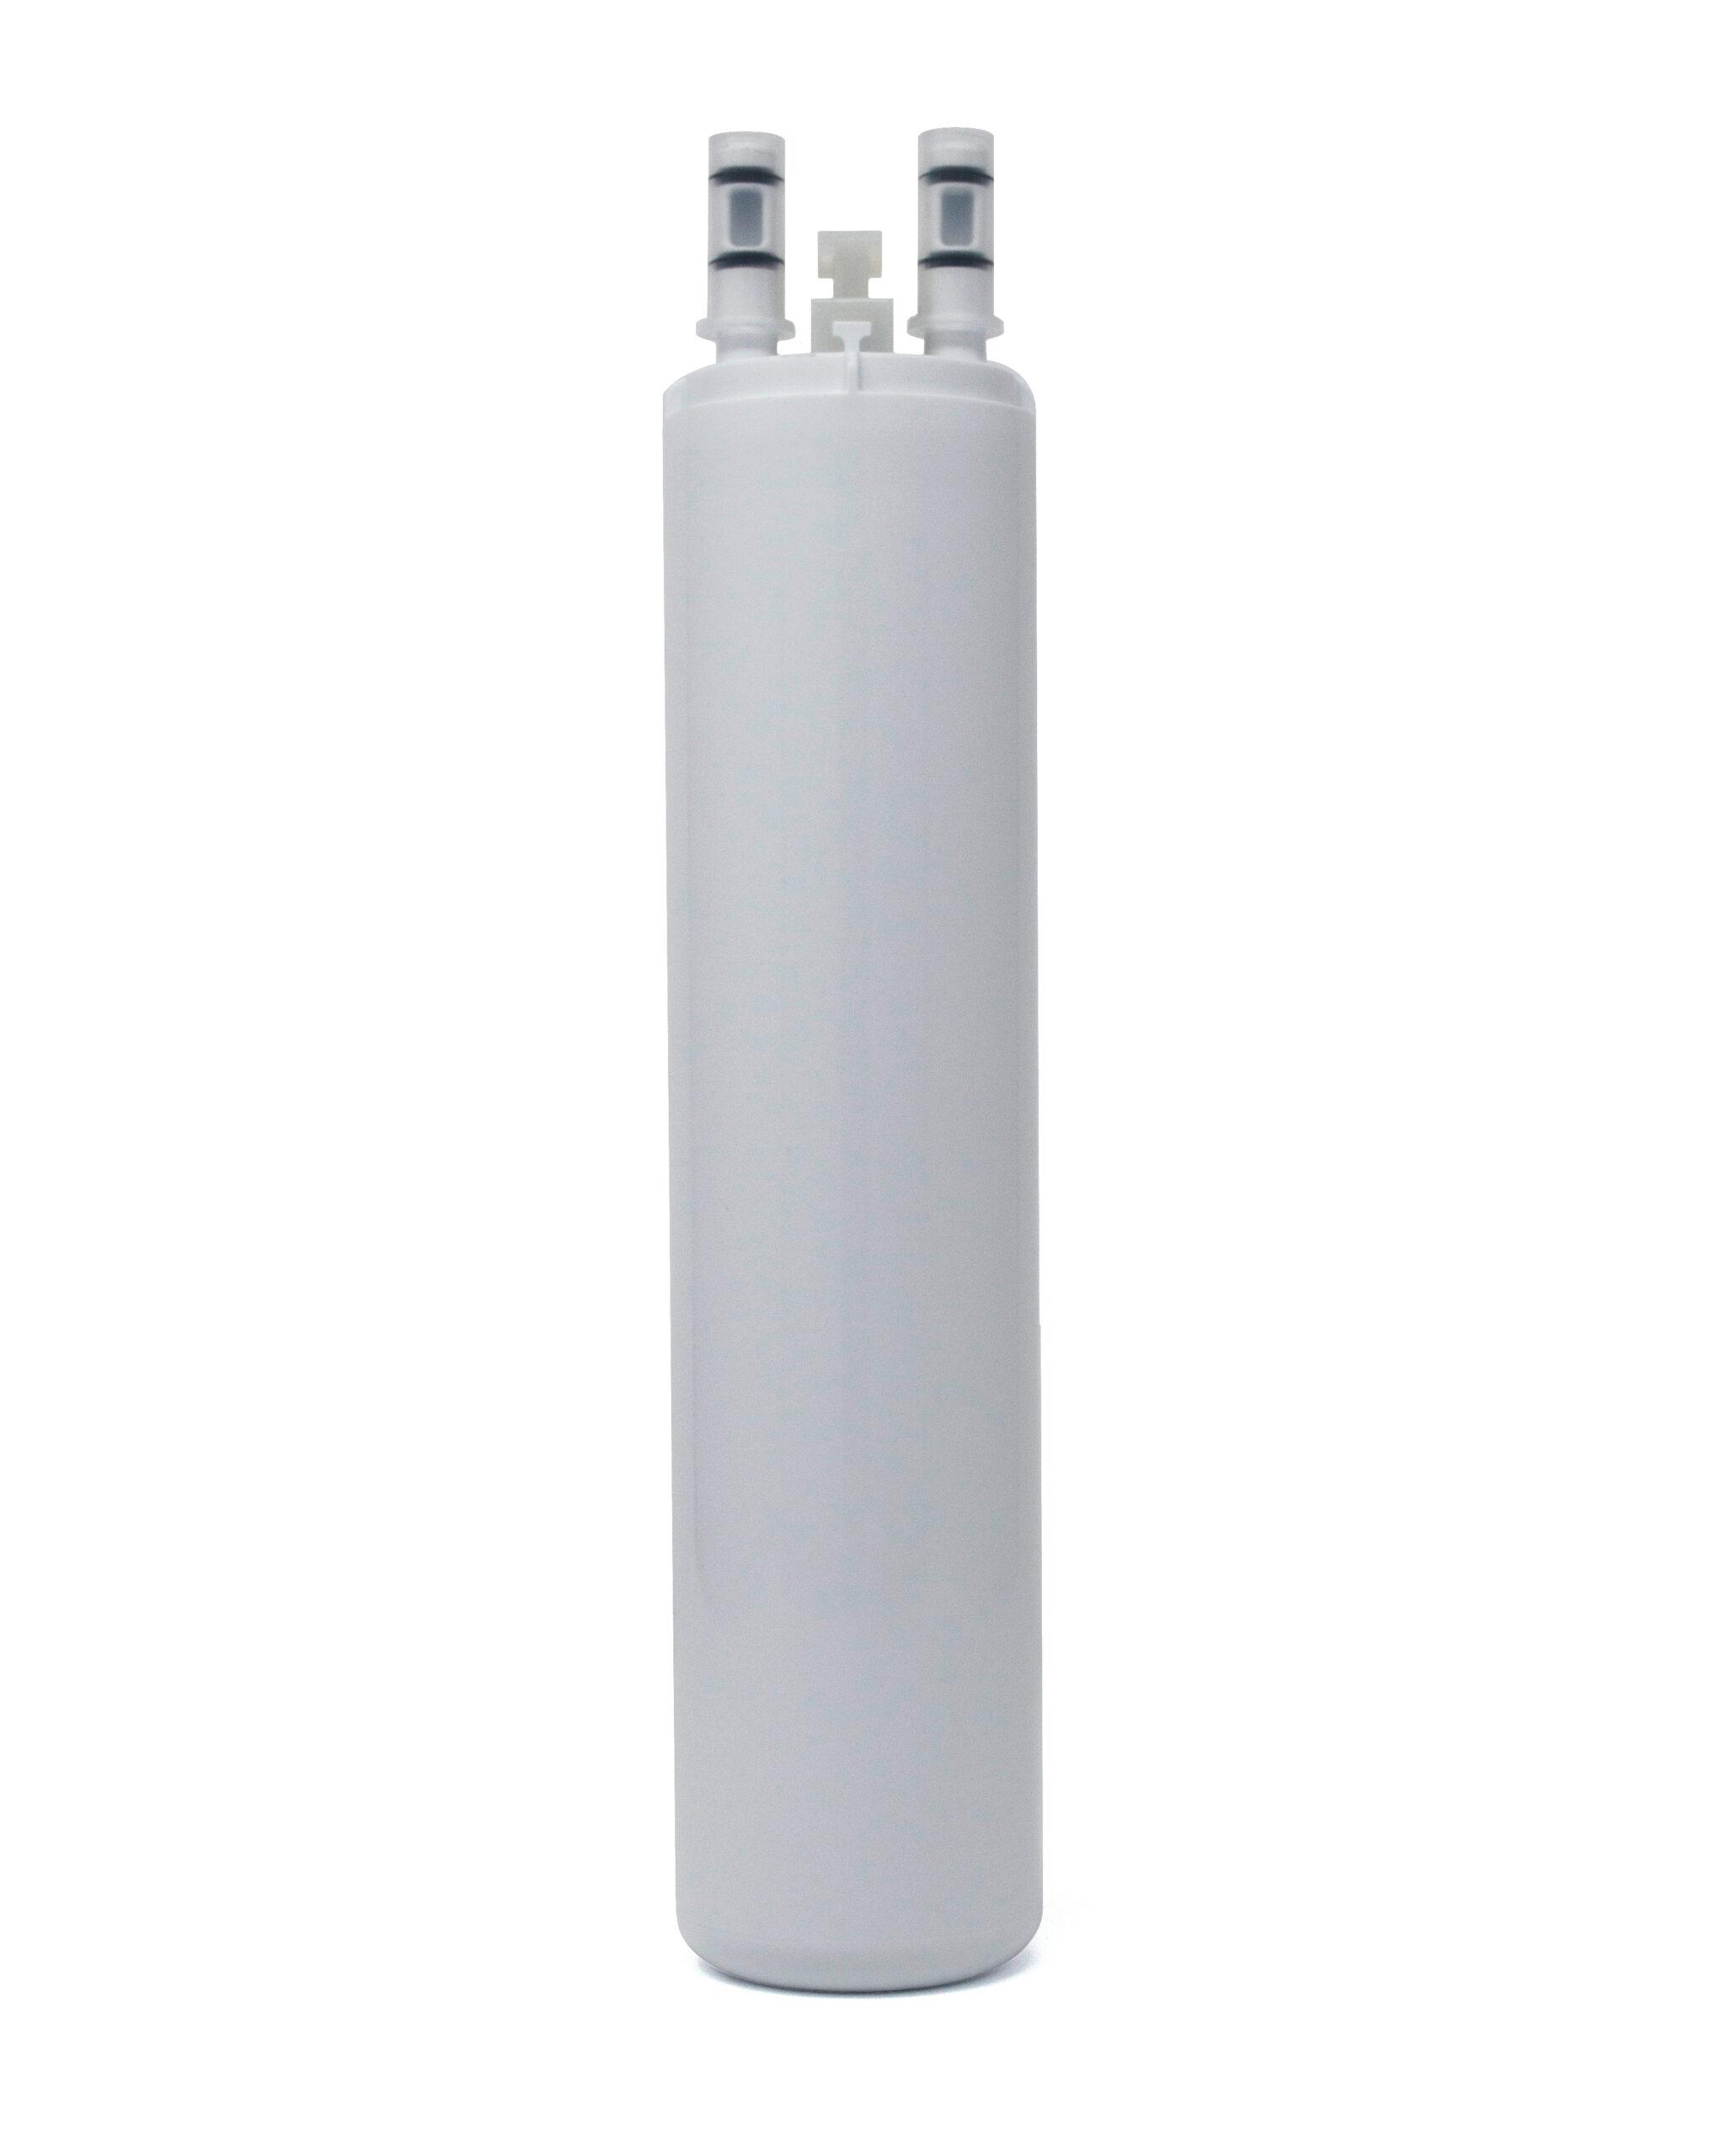 Appliance filter